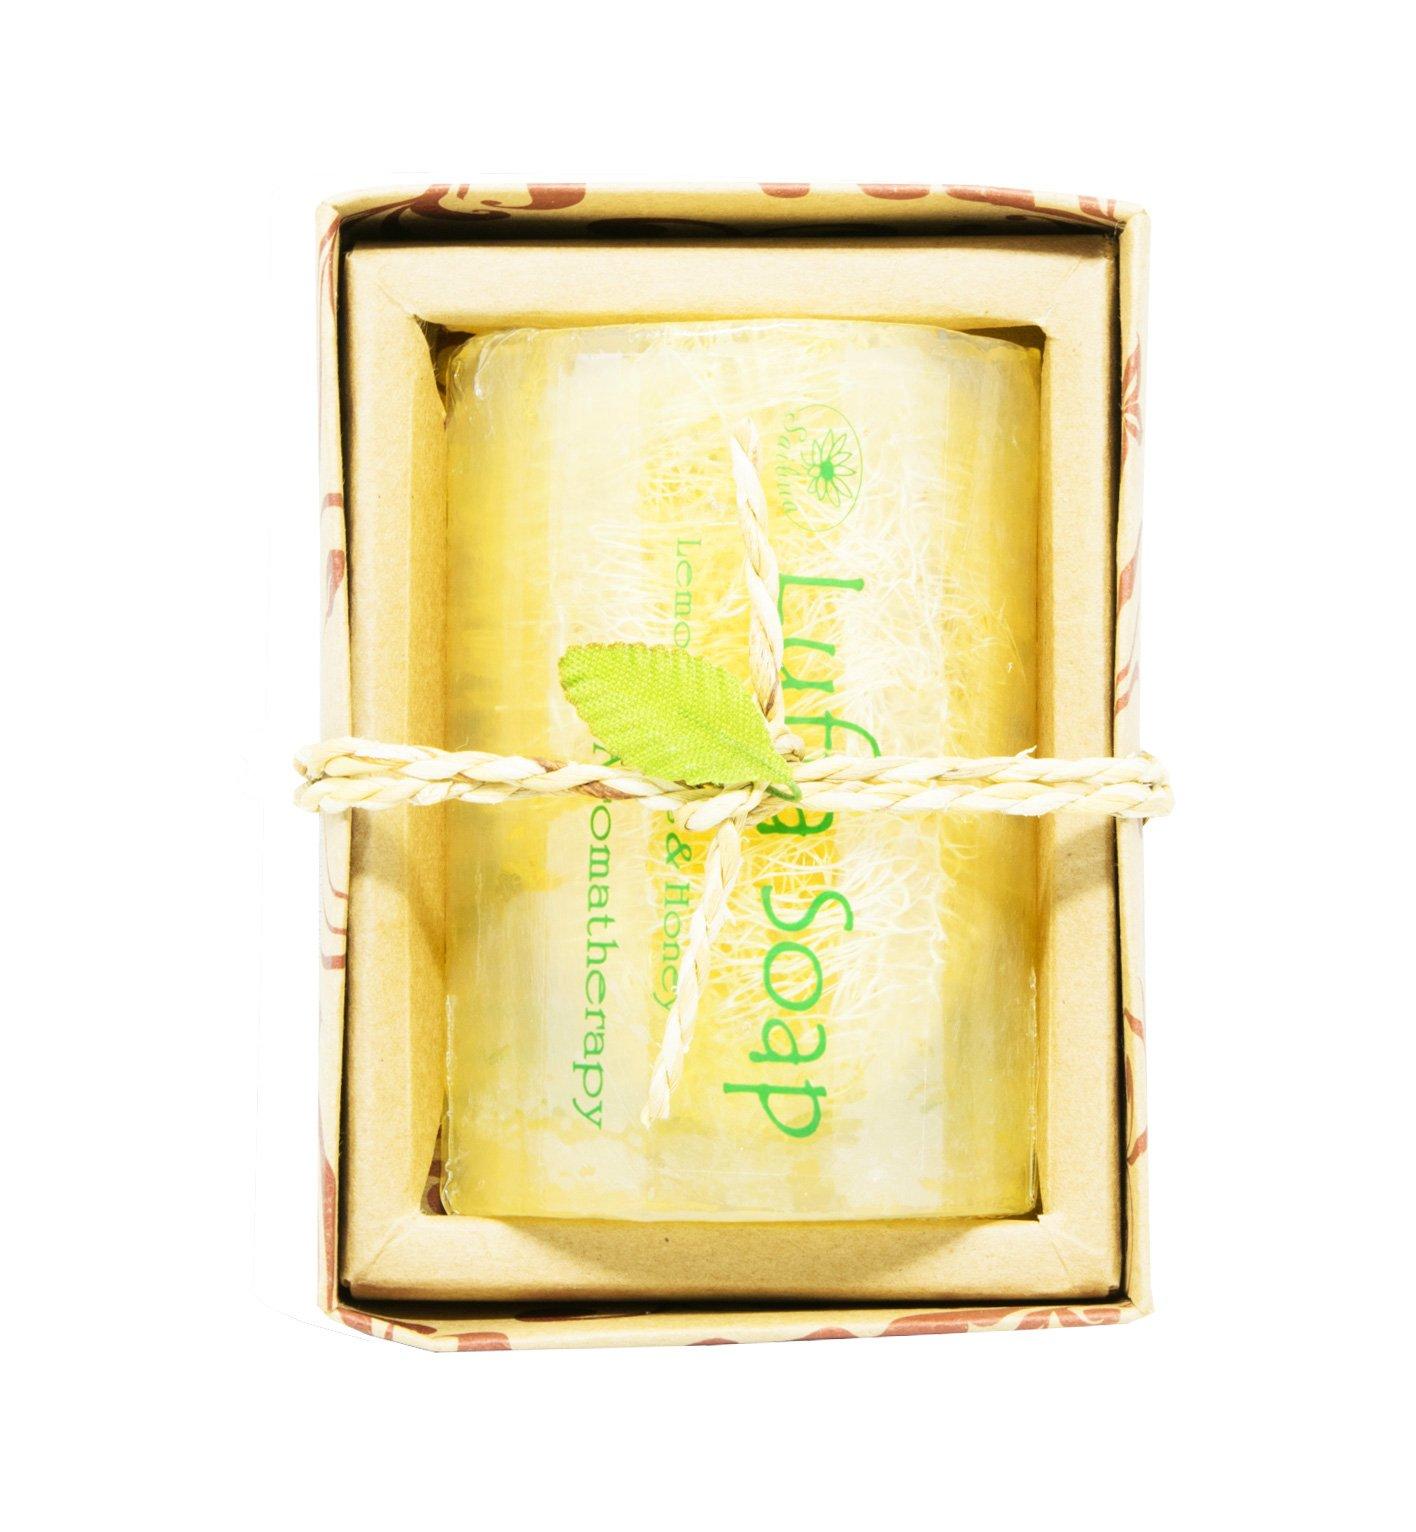 SAIBUA HANDMADE SOAP LUFFA SOAP AROMA LEMONGRASS HONEY SCRUB HERBAL NATURAL 100G.